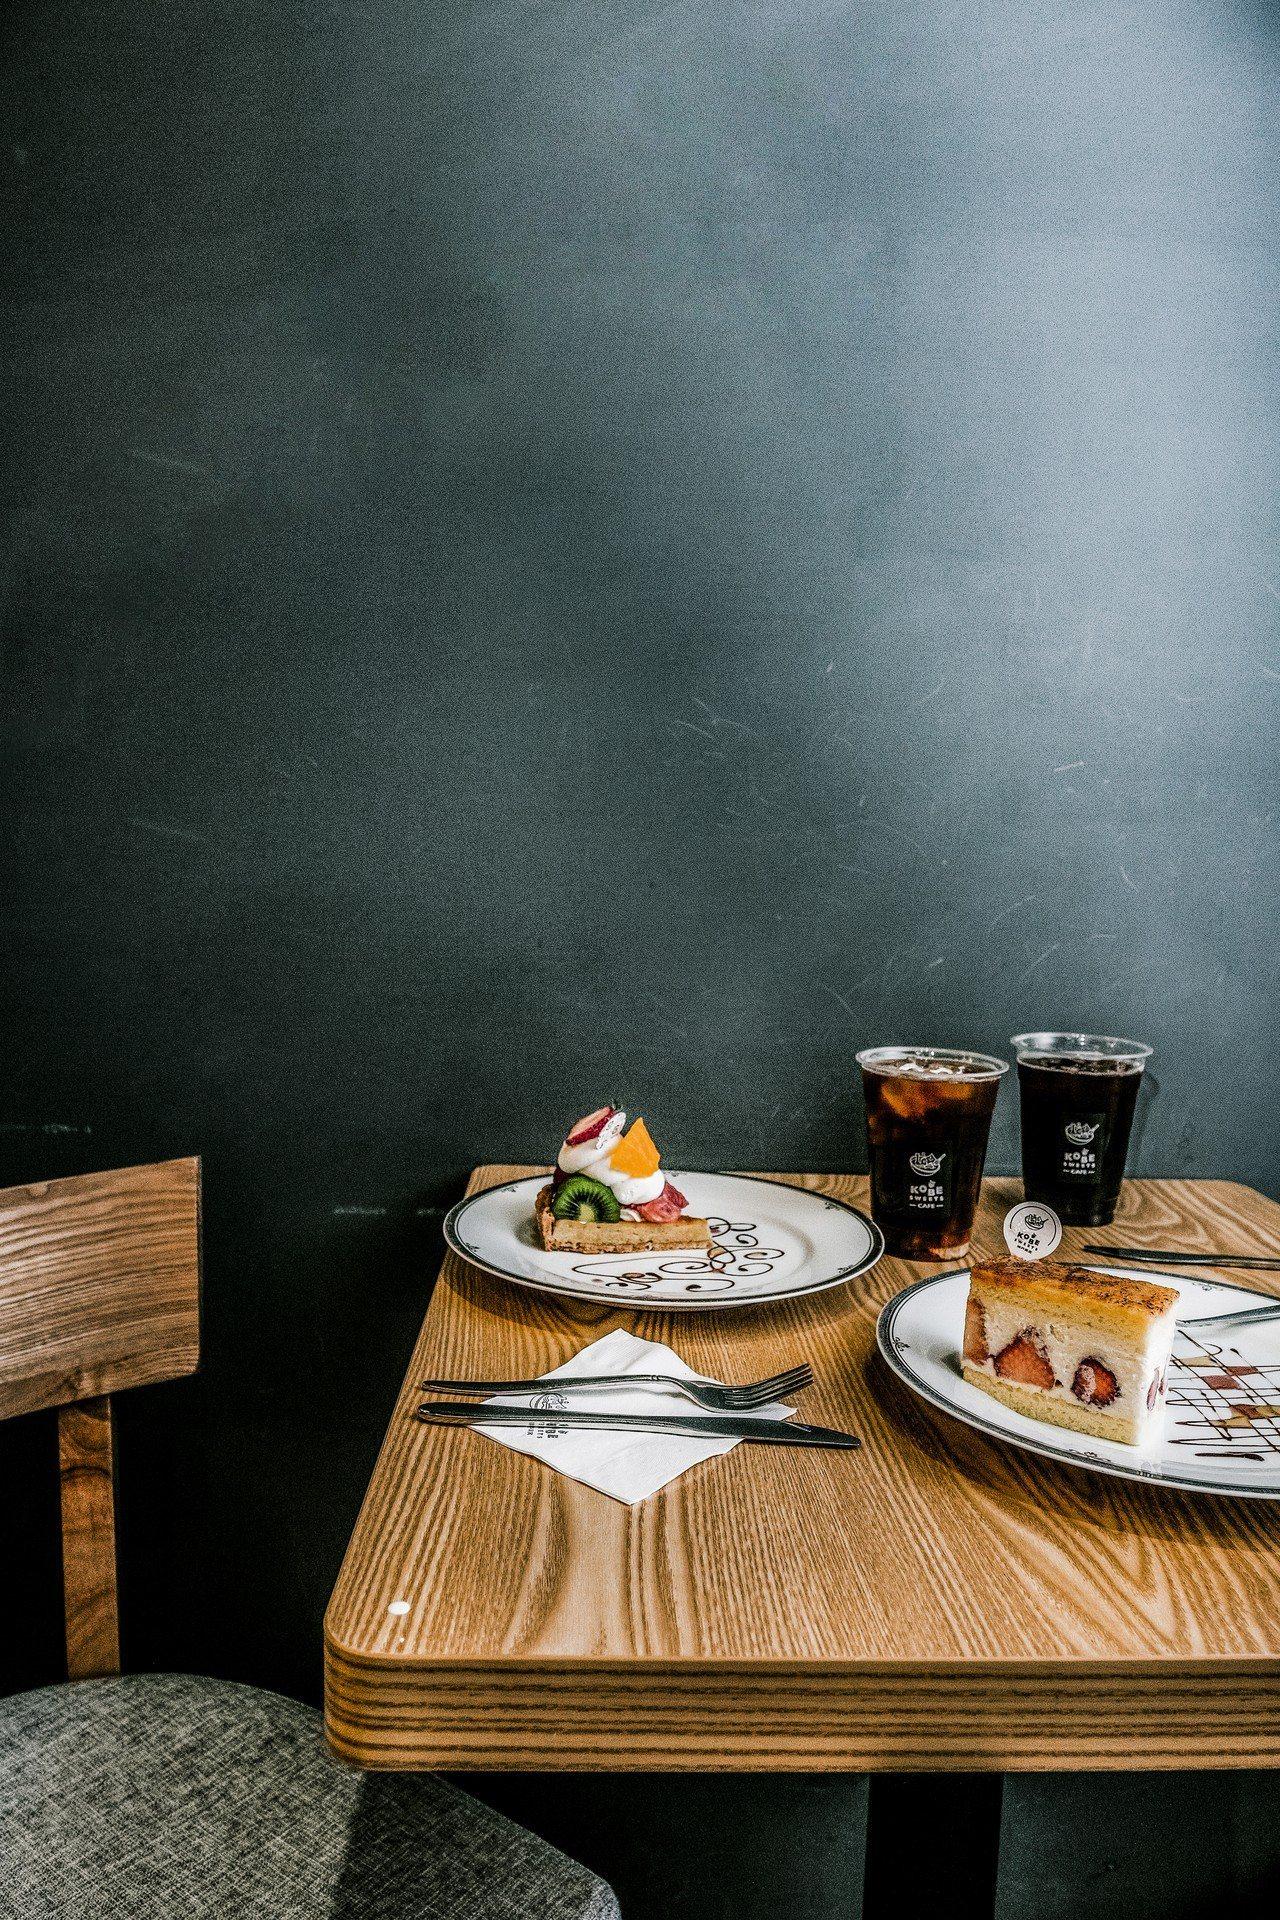 KOBE SWEETS CAFE的綜合水果塔與神戶卡士達奶油蛋糕,灰牆更可凸顯水...